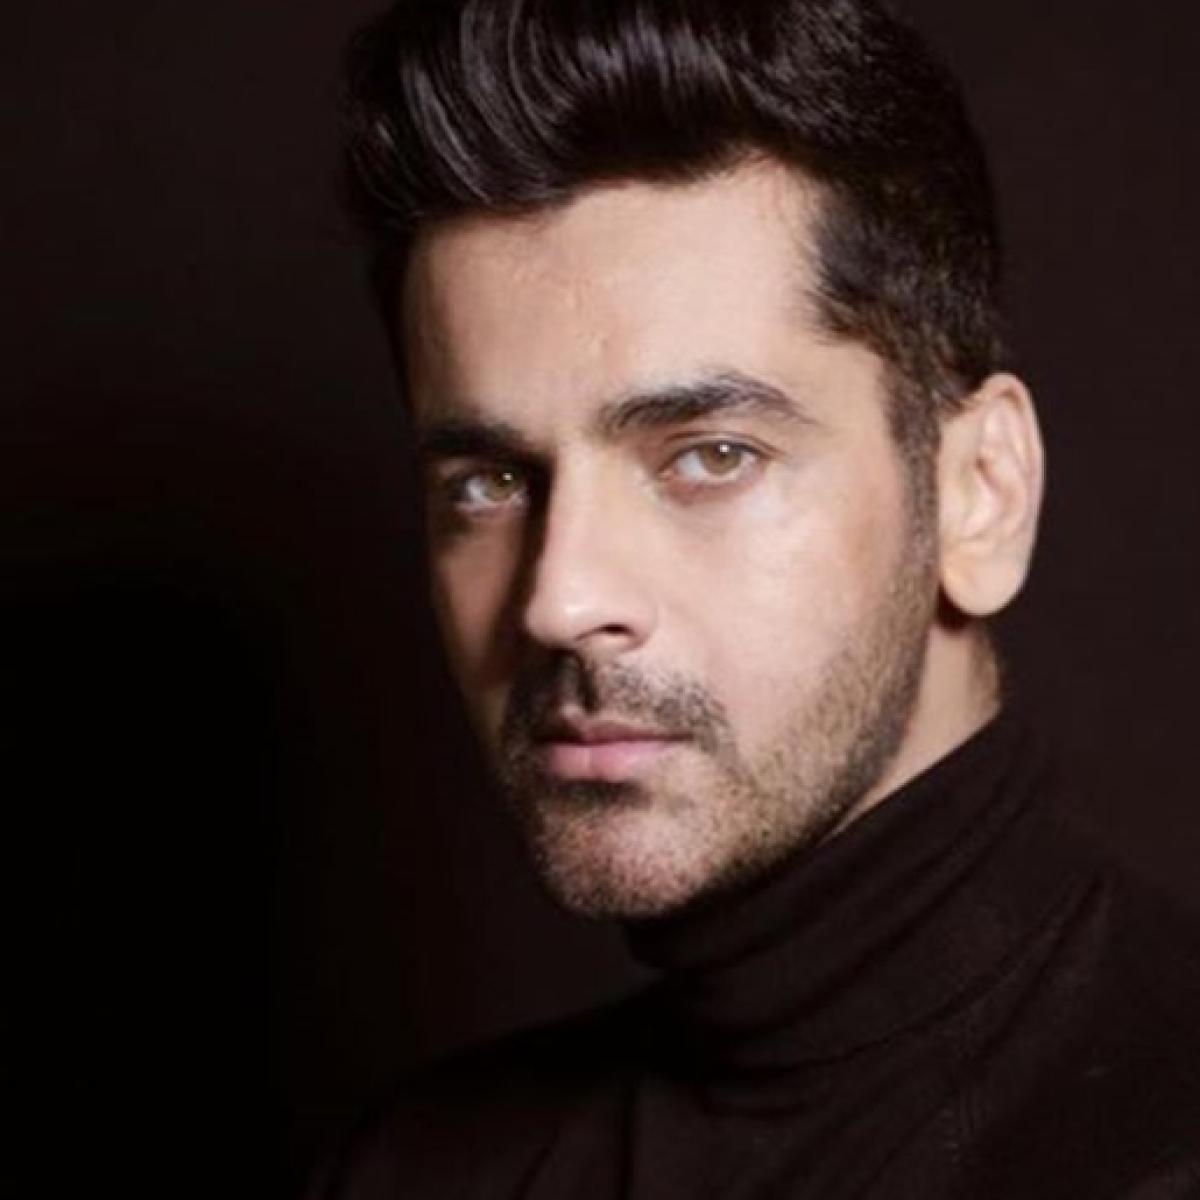 ''Kabir Singh' has transformed into a lot of work for me': Arjan Bajwa